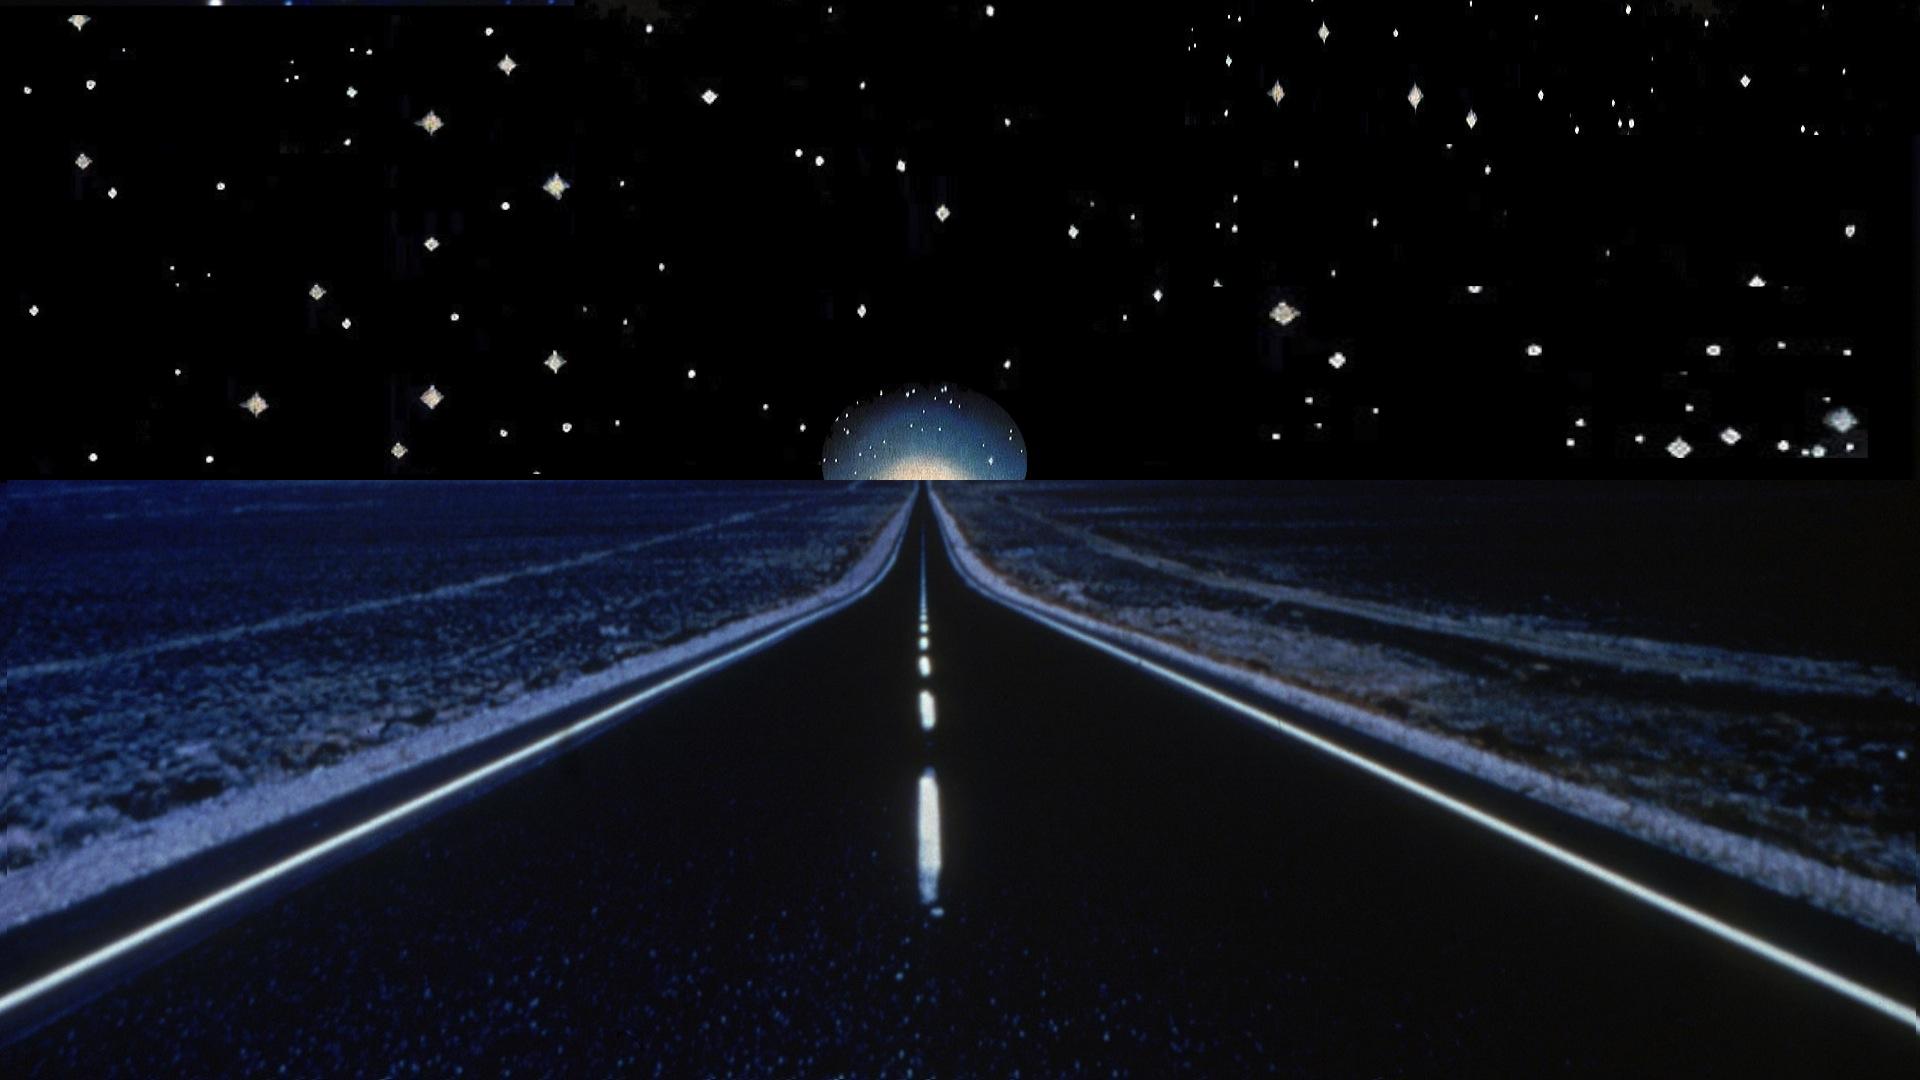 Car Curvy Road Wallpaper Close Encounters Of The Third Kind Sci Fi Drama Thriller